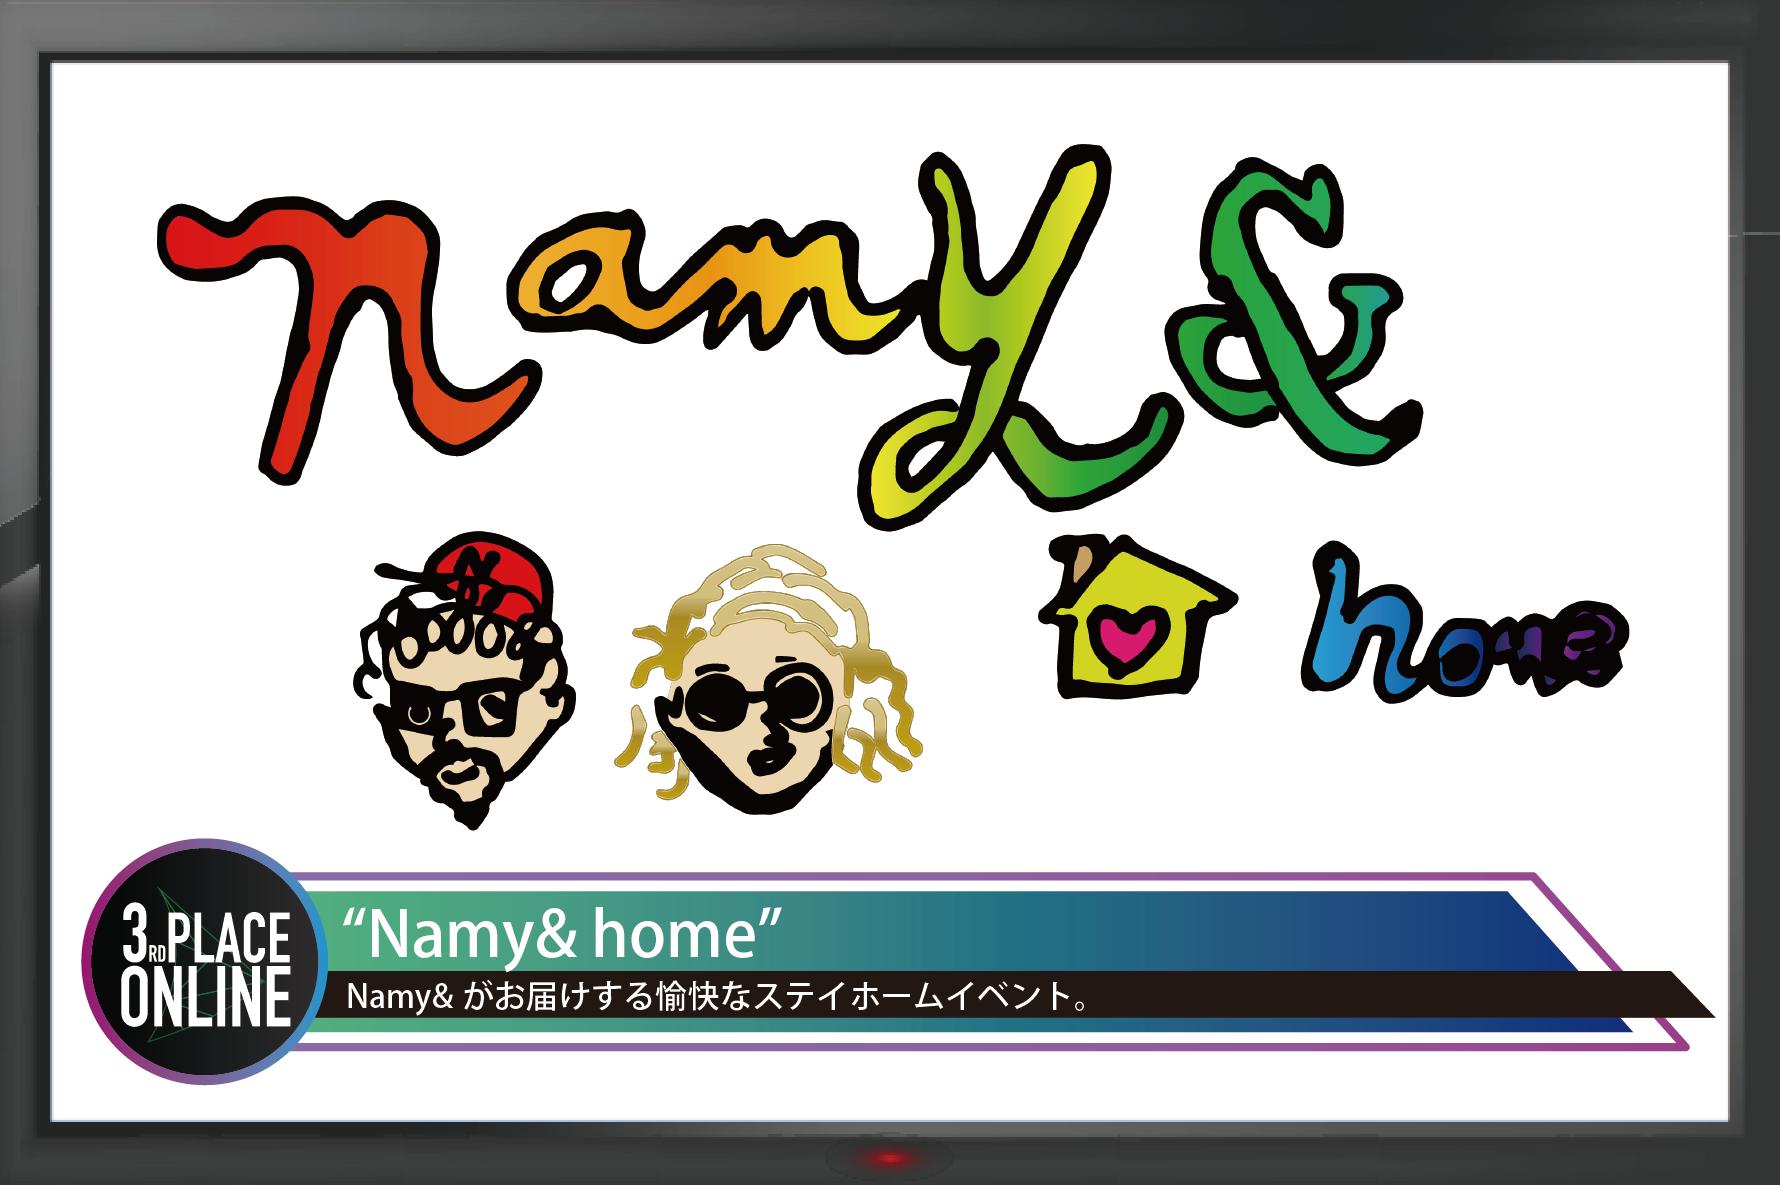 Namy& home